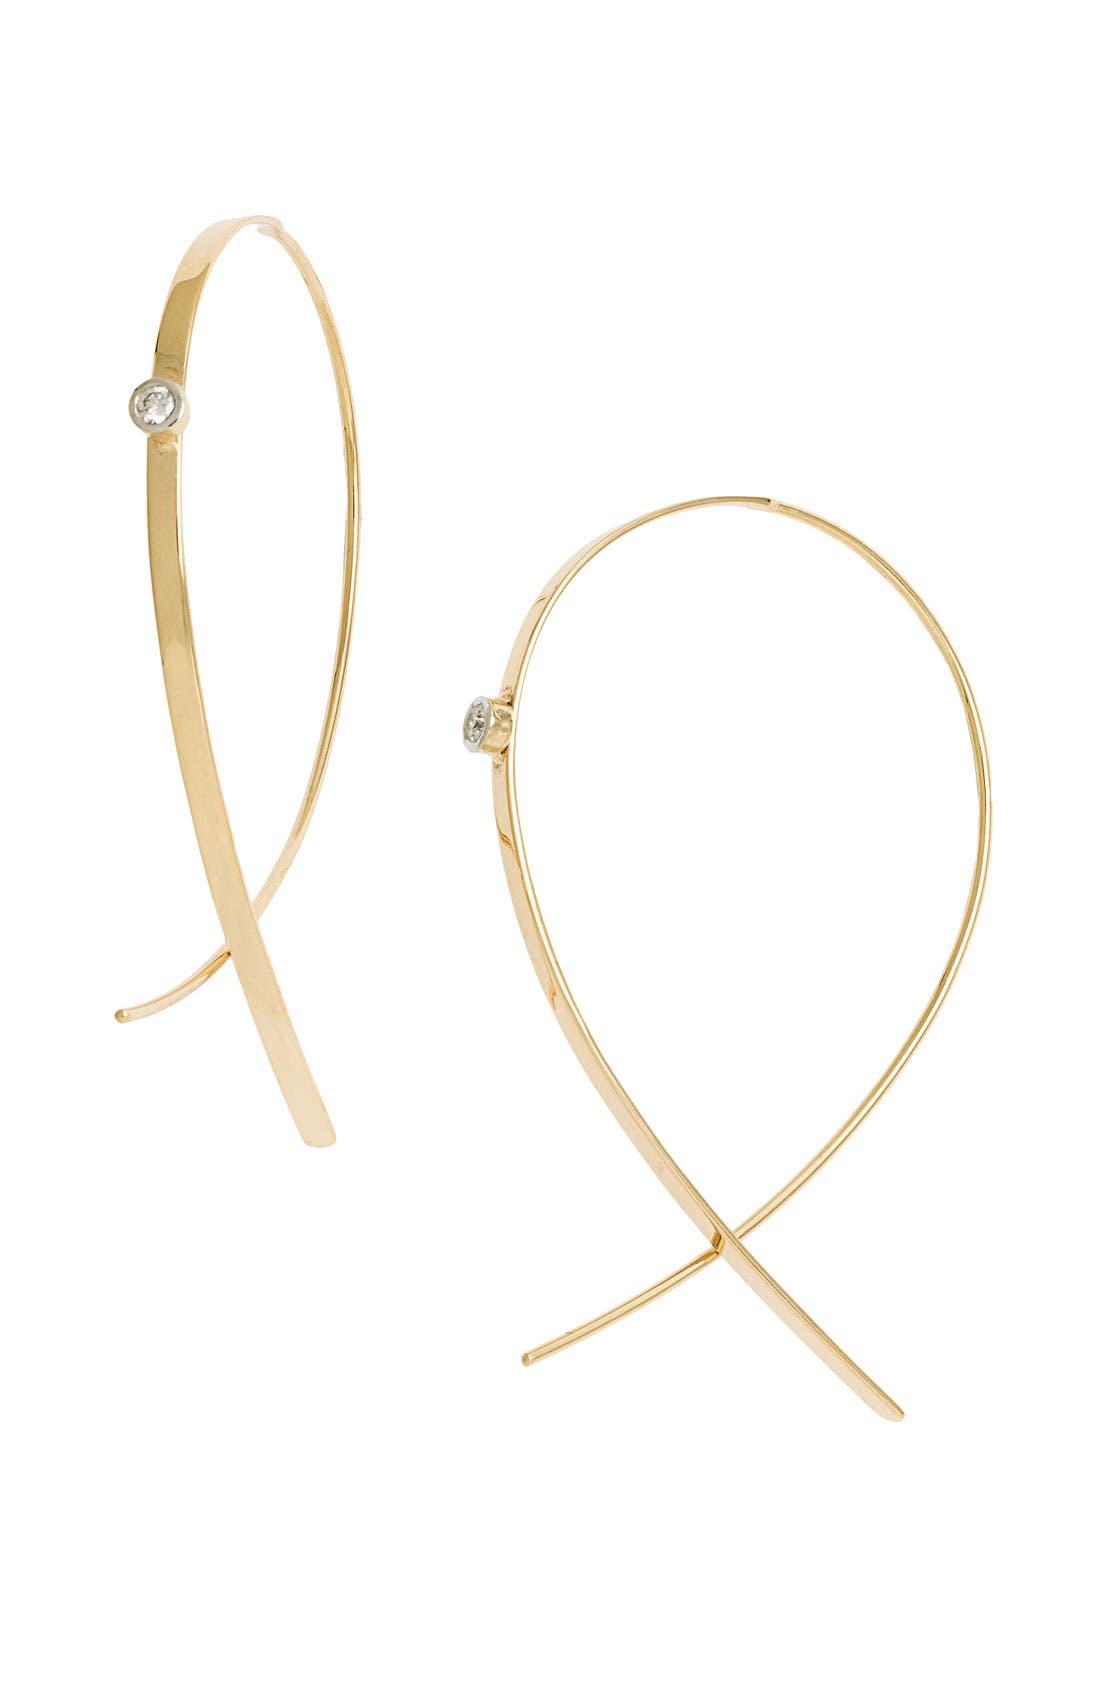 Alternate Image 1 Selected - Lana Jewelry 'Small Upside Down' Diamond Hoop Earrings